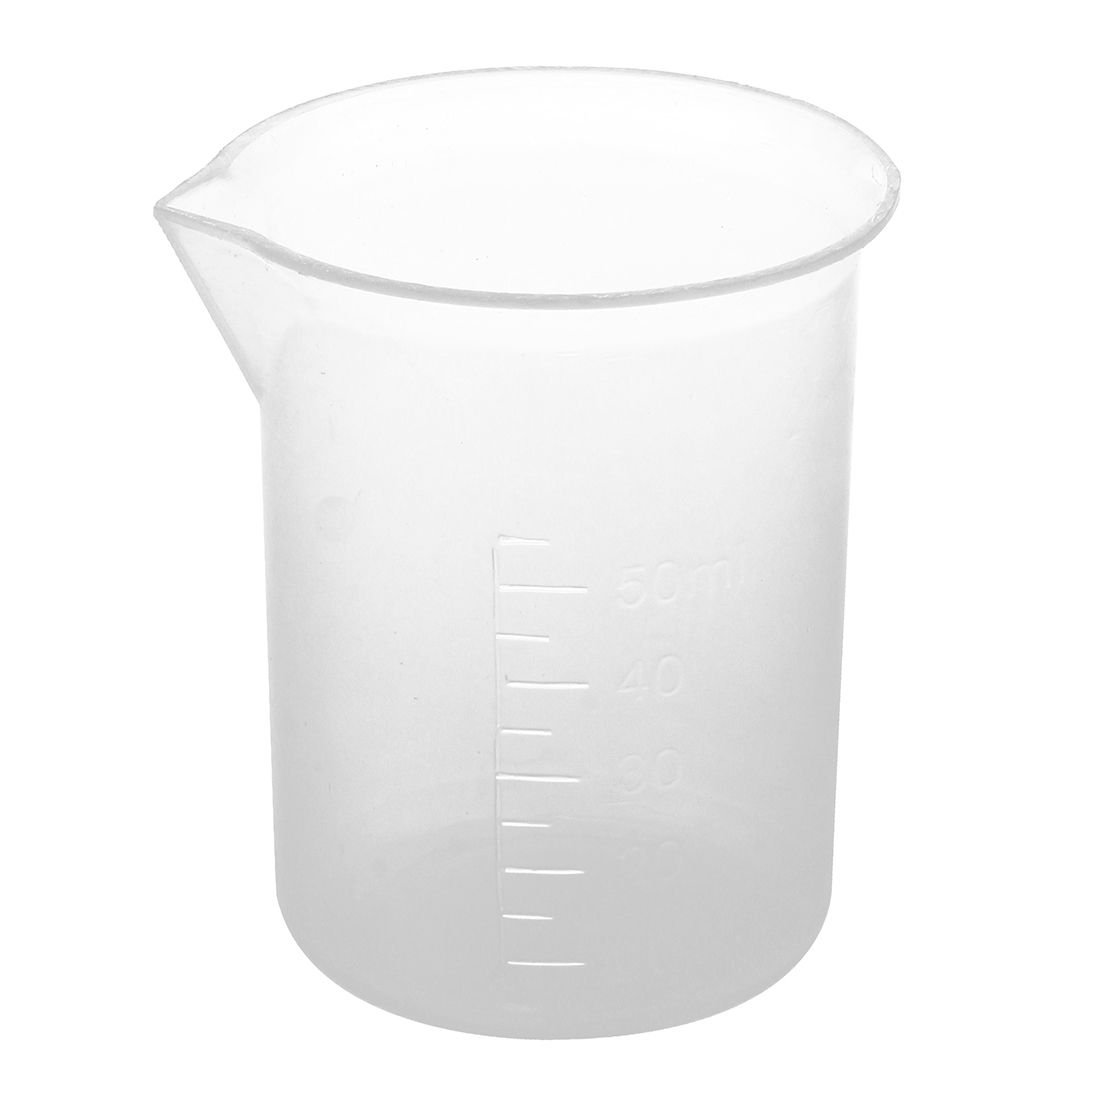 TOOGOO 50mL Clear Plastic Graduated Measuring Cup for Biochemistry lab Scale Mug